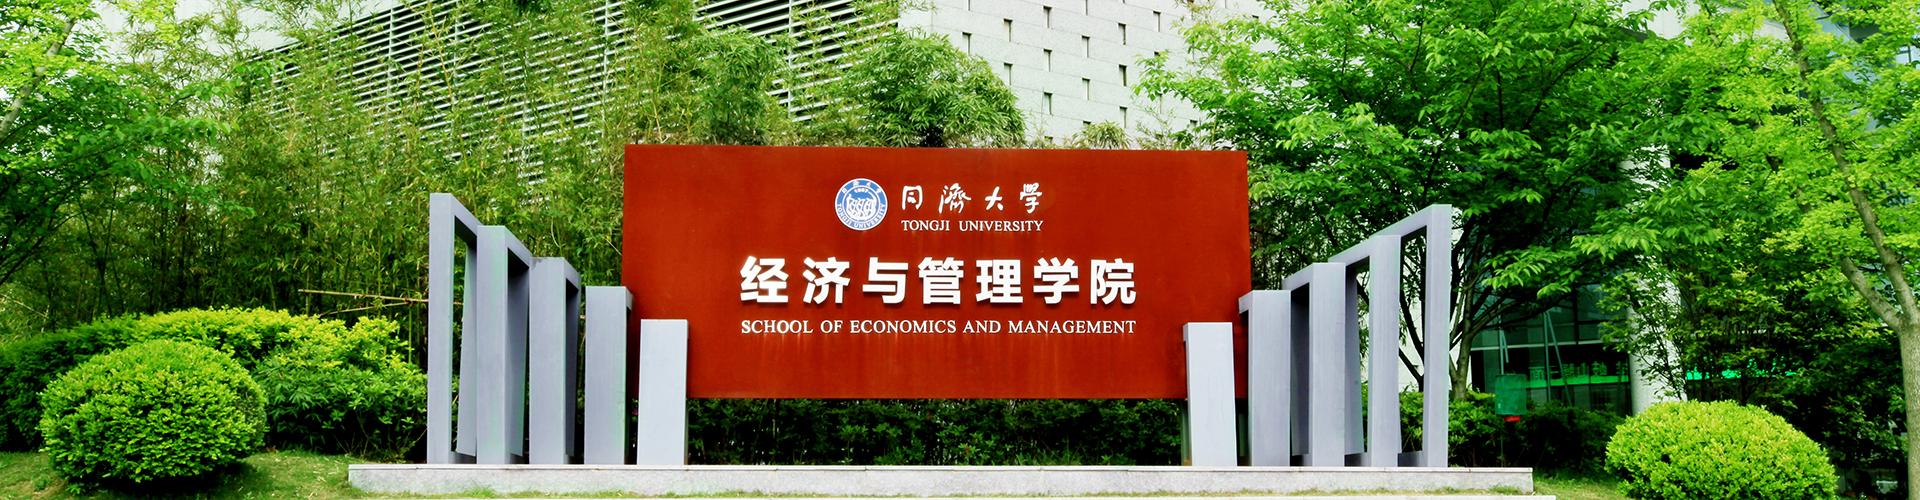 Master of Global Management Program at Tongji